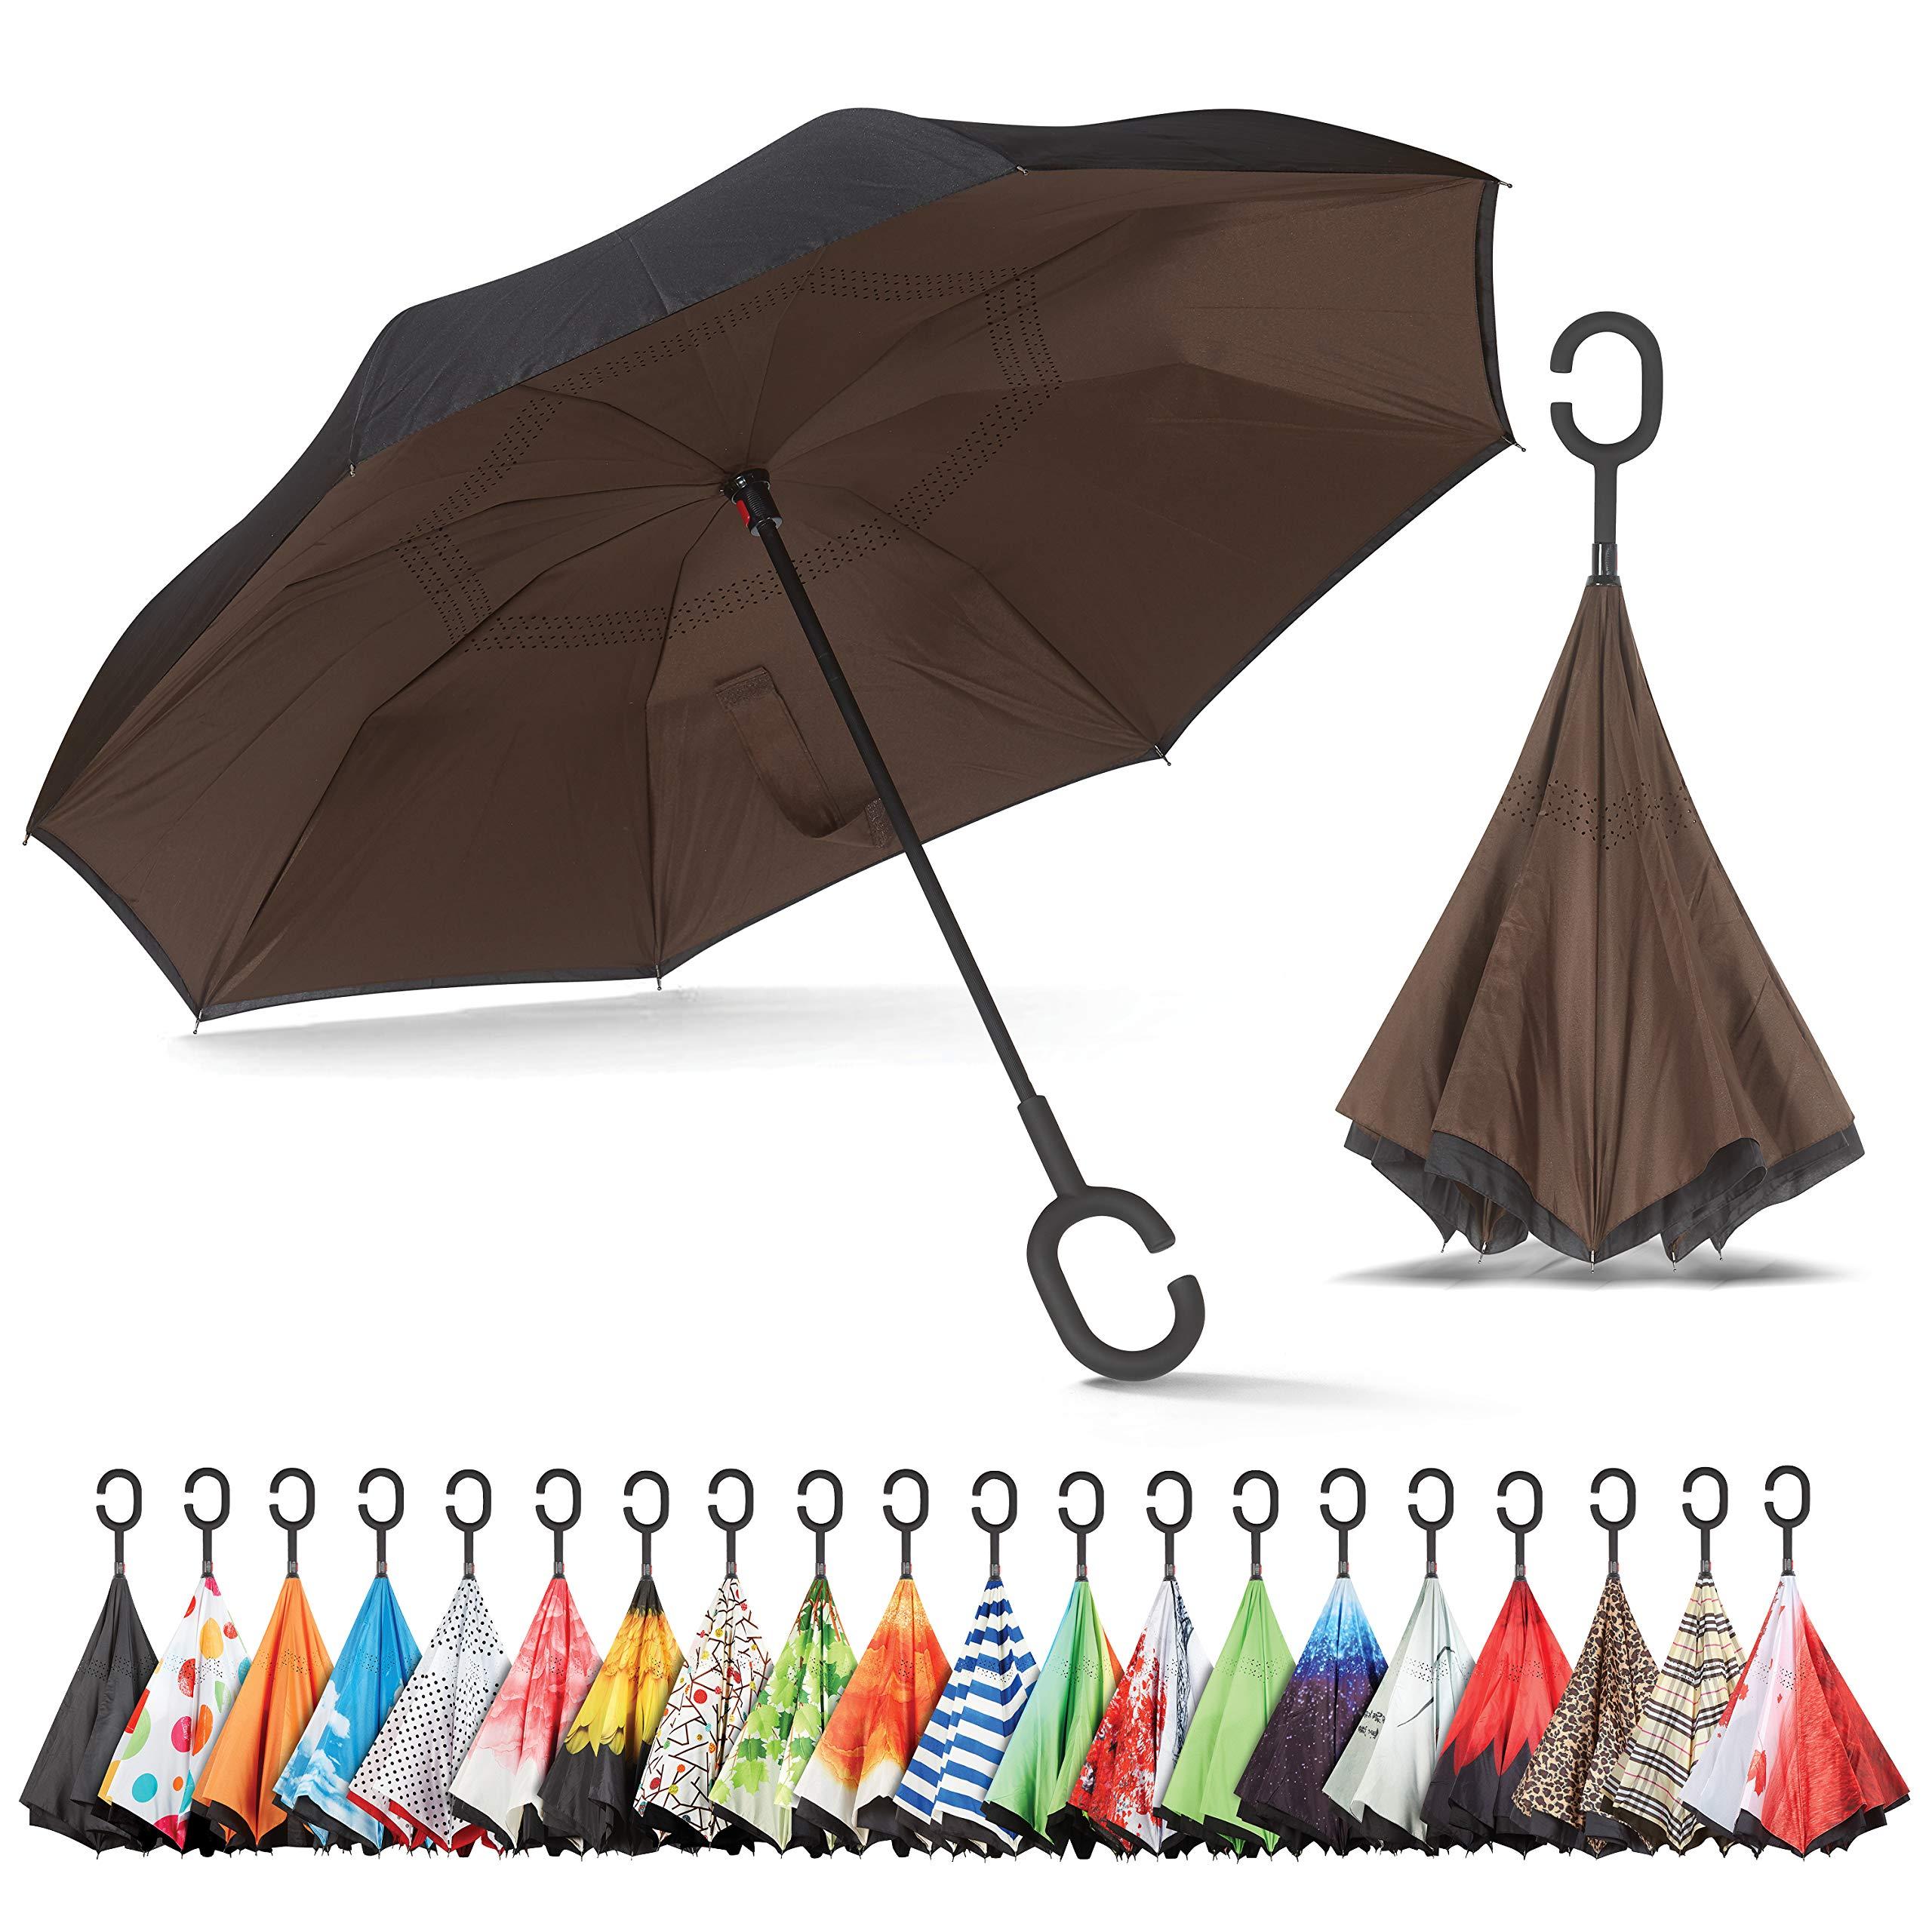 Sharpty Inverted Umbrella, Umbrella Windproof, Reverse Umbrella, Umbrellas for Women with UV Protection, Upside Down Umbrella with C-Shaped Handle (Black - Coffee)